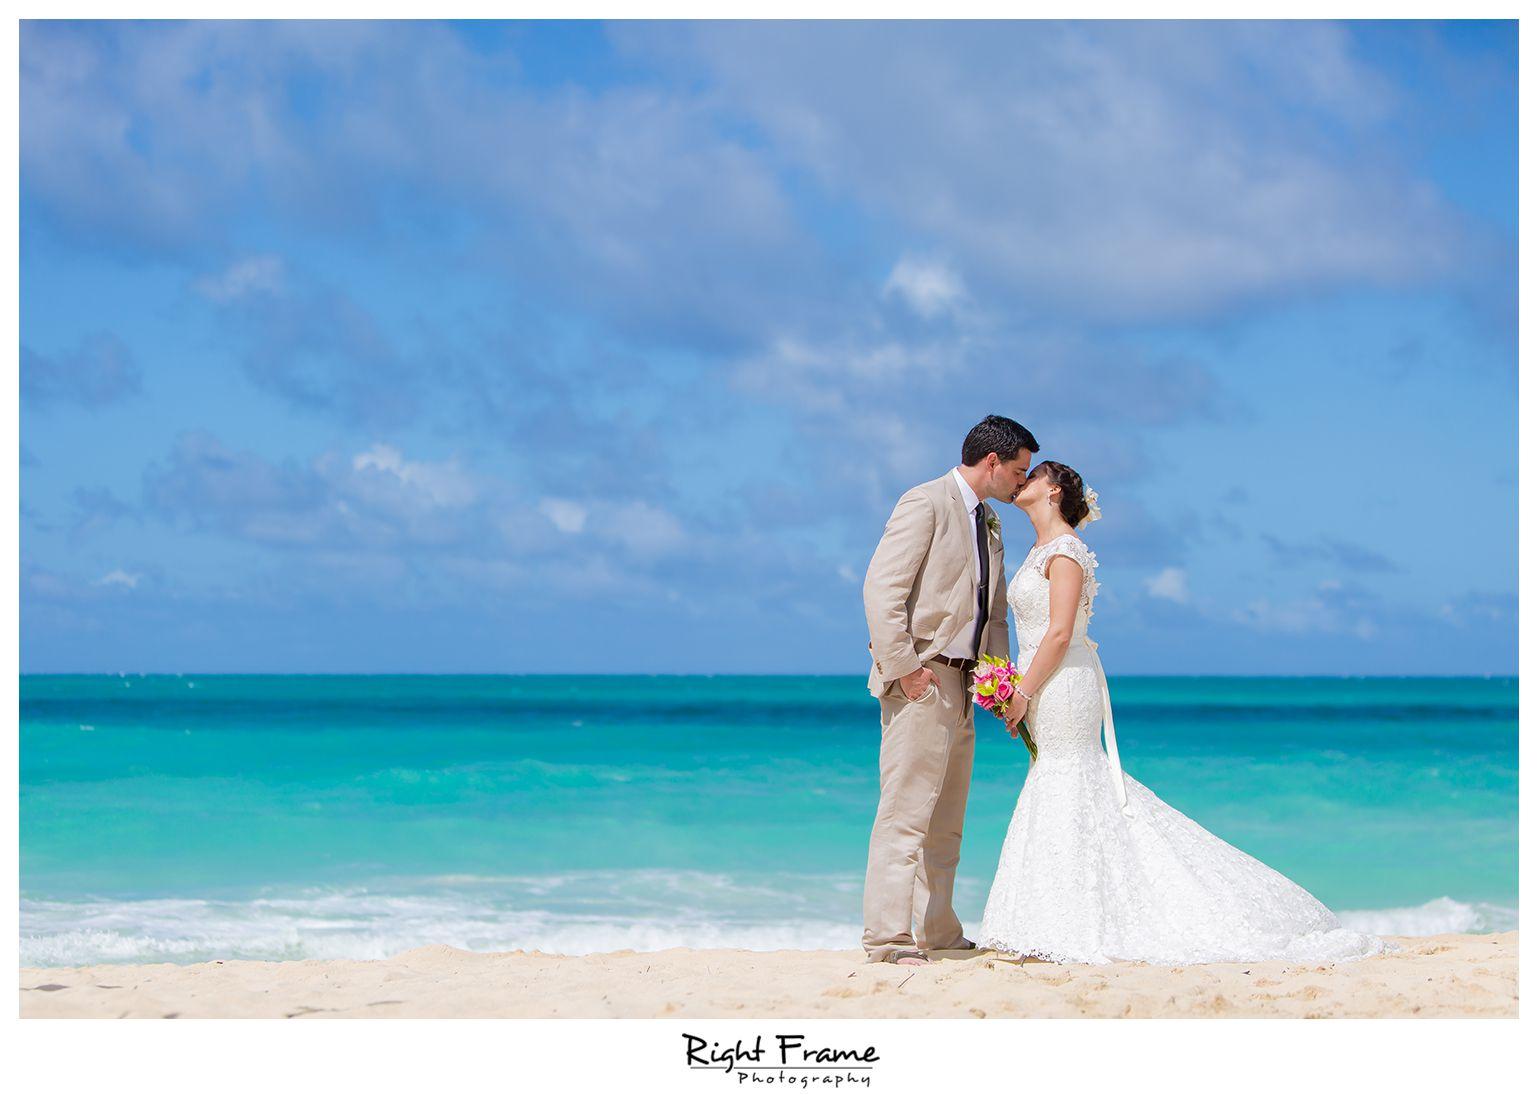 026_Oahu Beach Wedding waimanalo beach